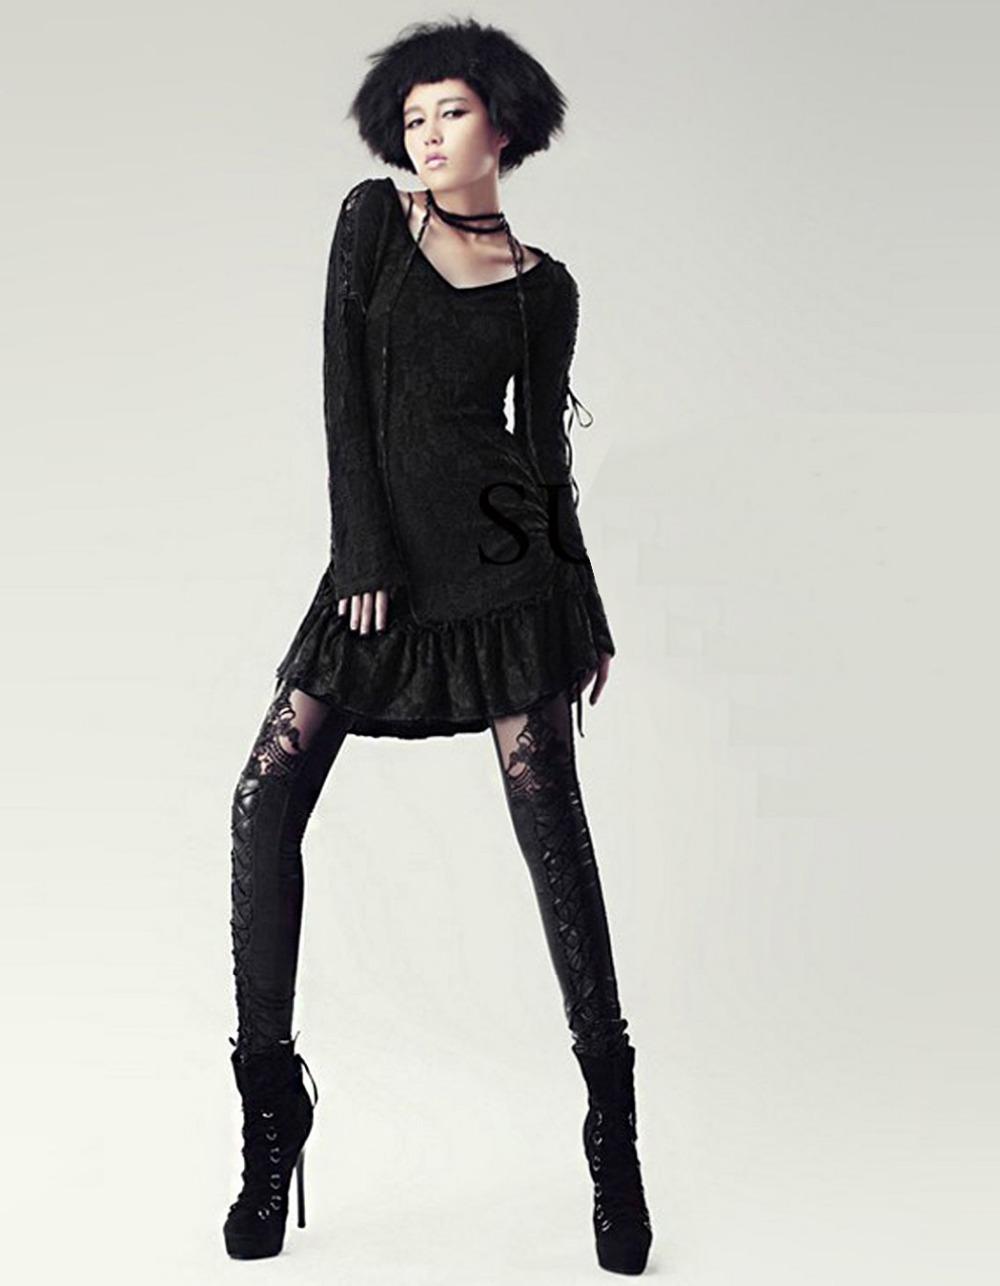 Black Legins Punk Gothic Fashion Women Leggings Sexy PU Leather Stitching Embroidery Hollow Lace Legging For Women Leggins 15 10